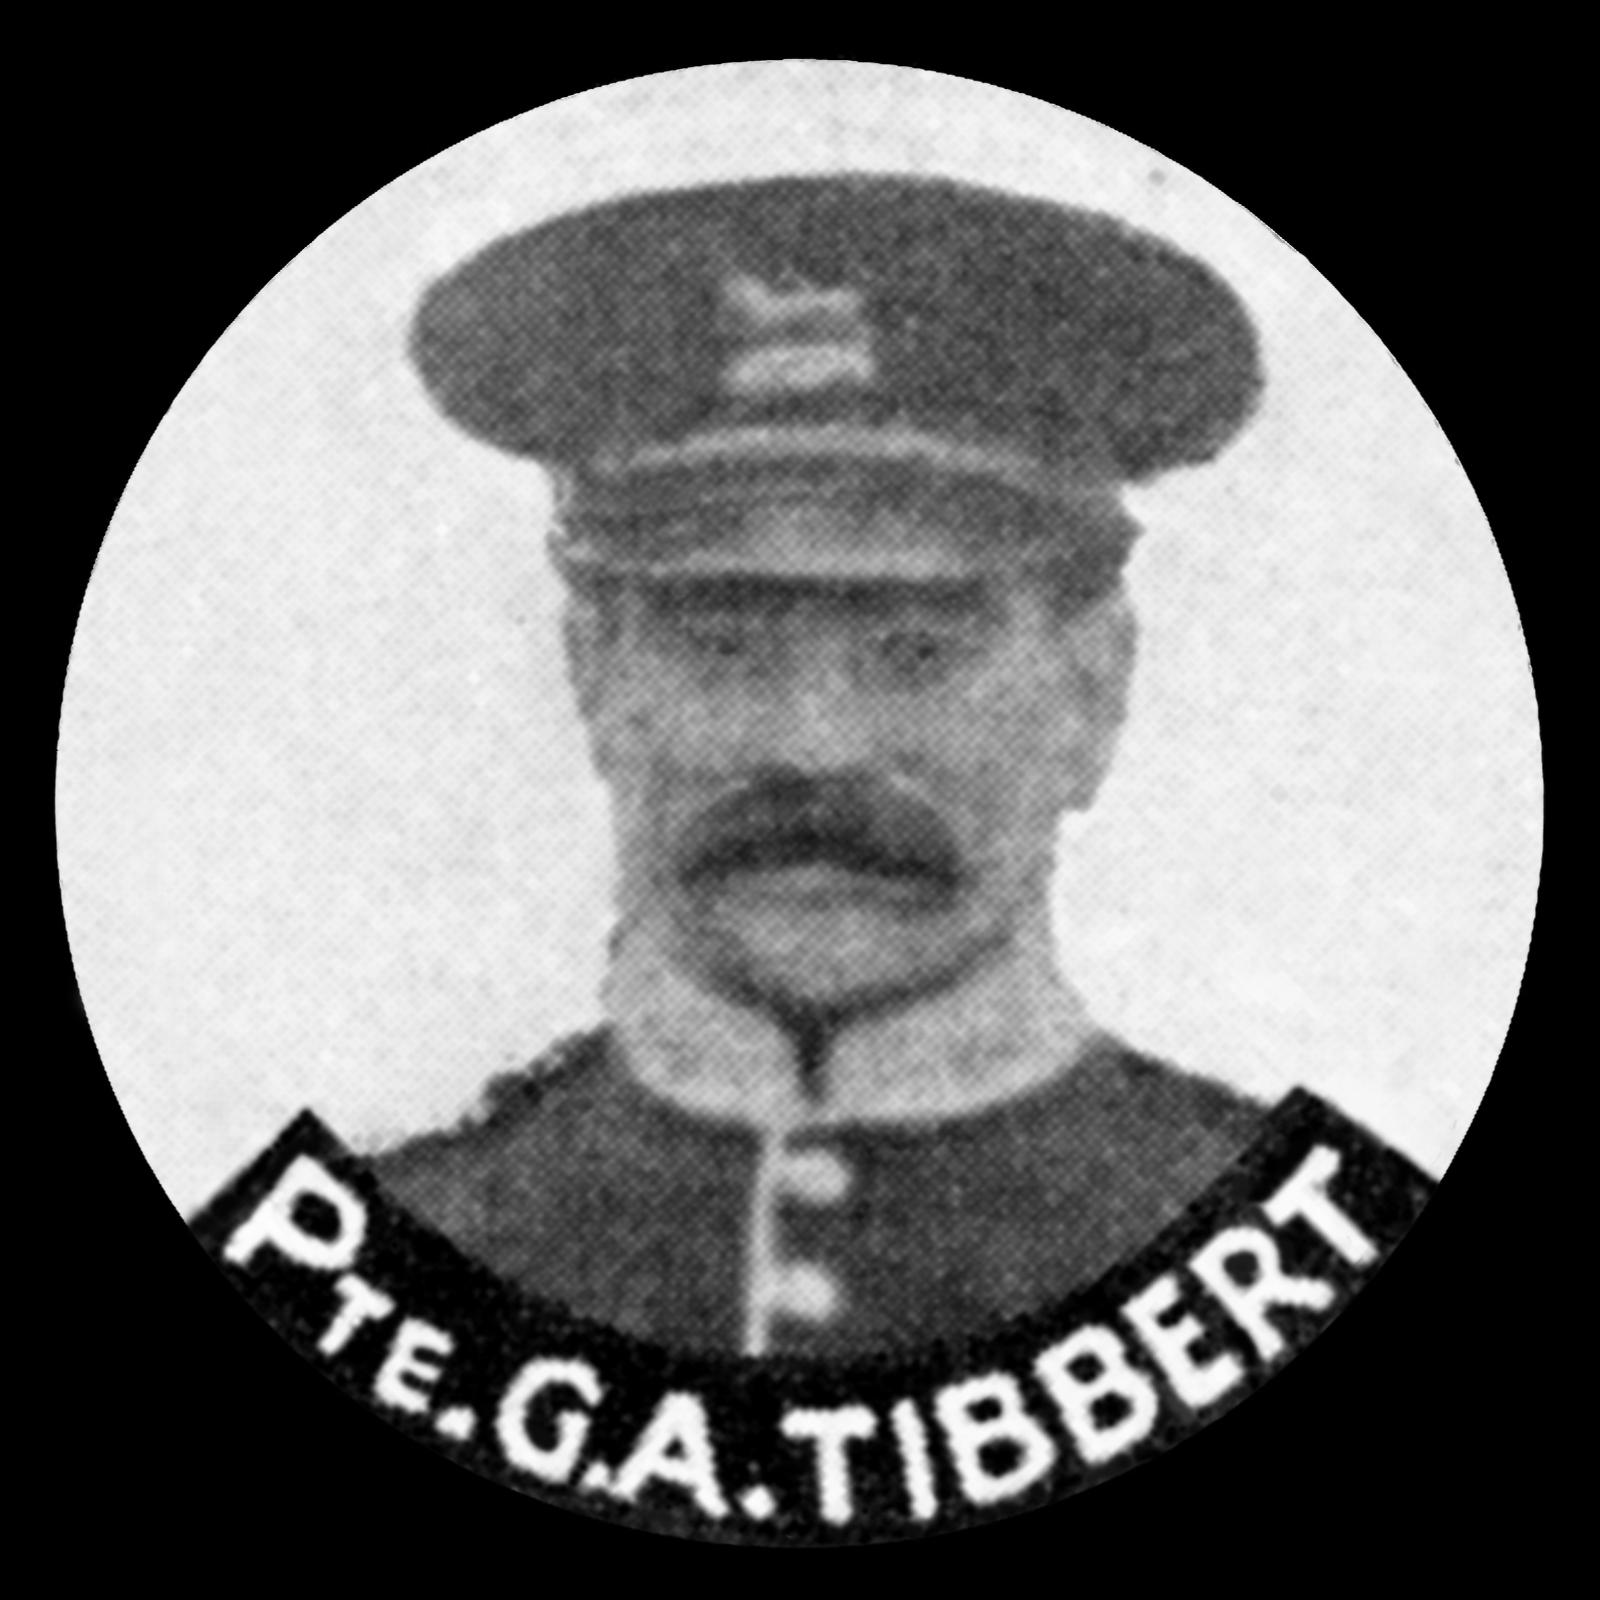 TIBBERT George Alfred